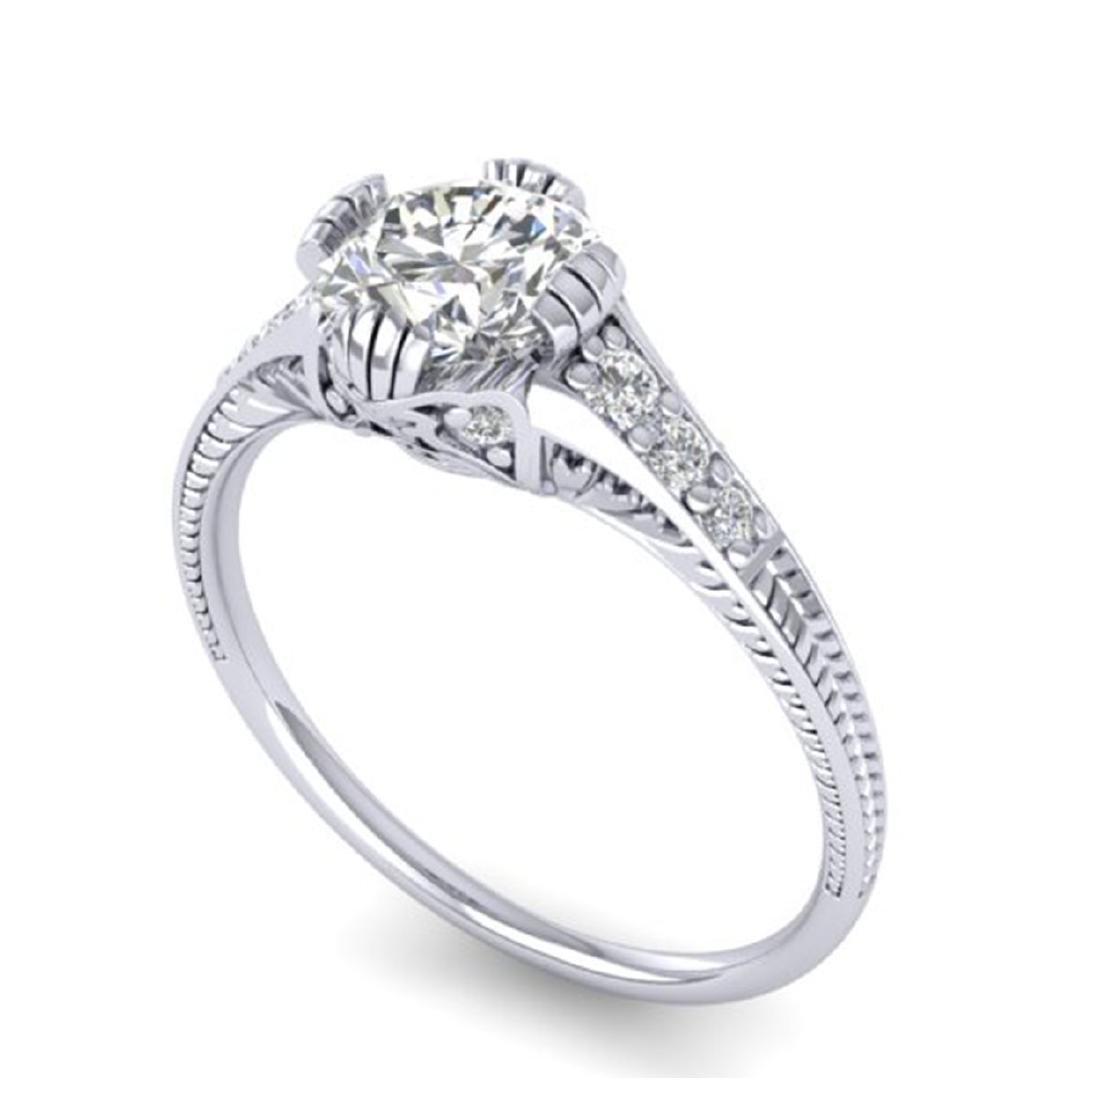 1.25 CTW Certified VS/SI Diamond Solitaire Art Deco - 2